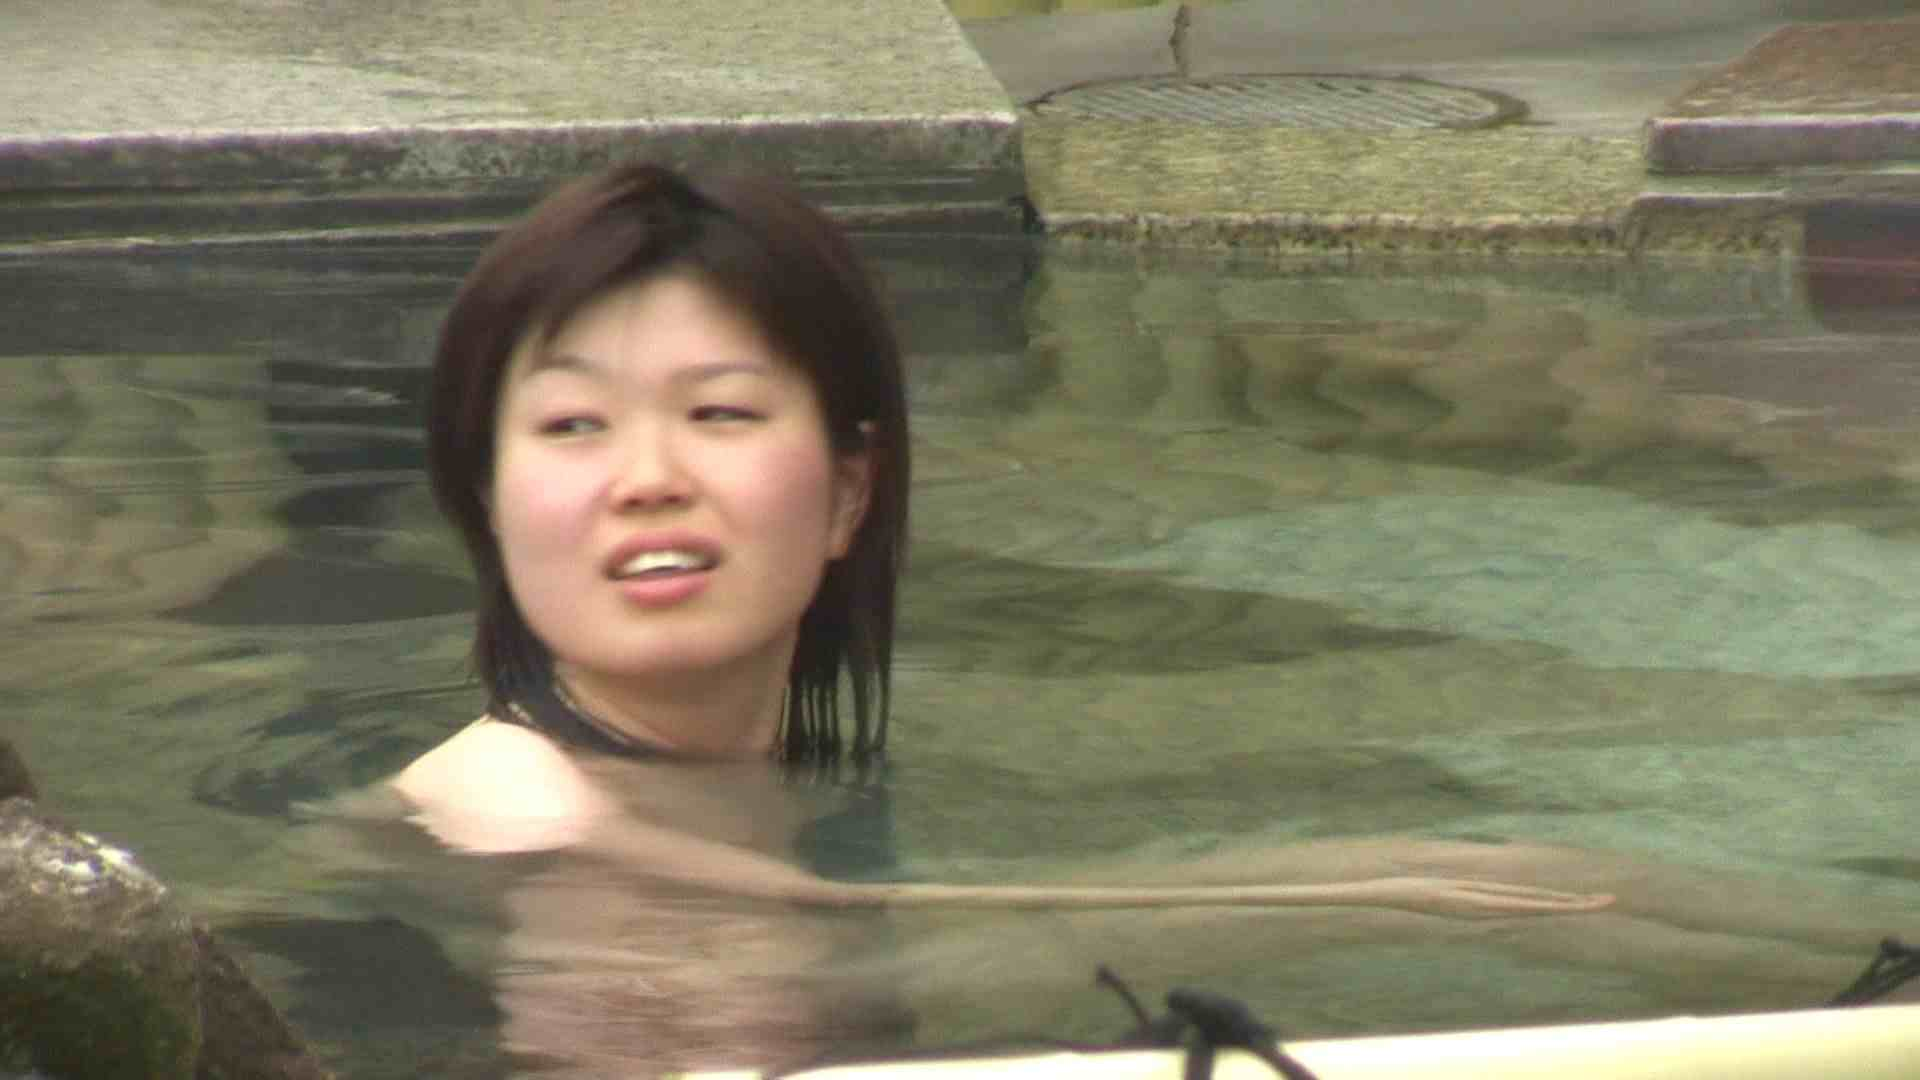 Aquaな露天風呂Vol.675 0   0  44連発 15